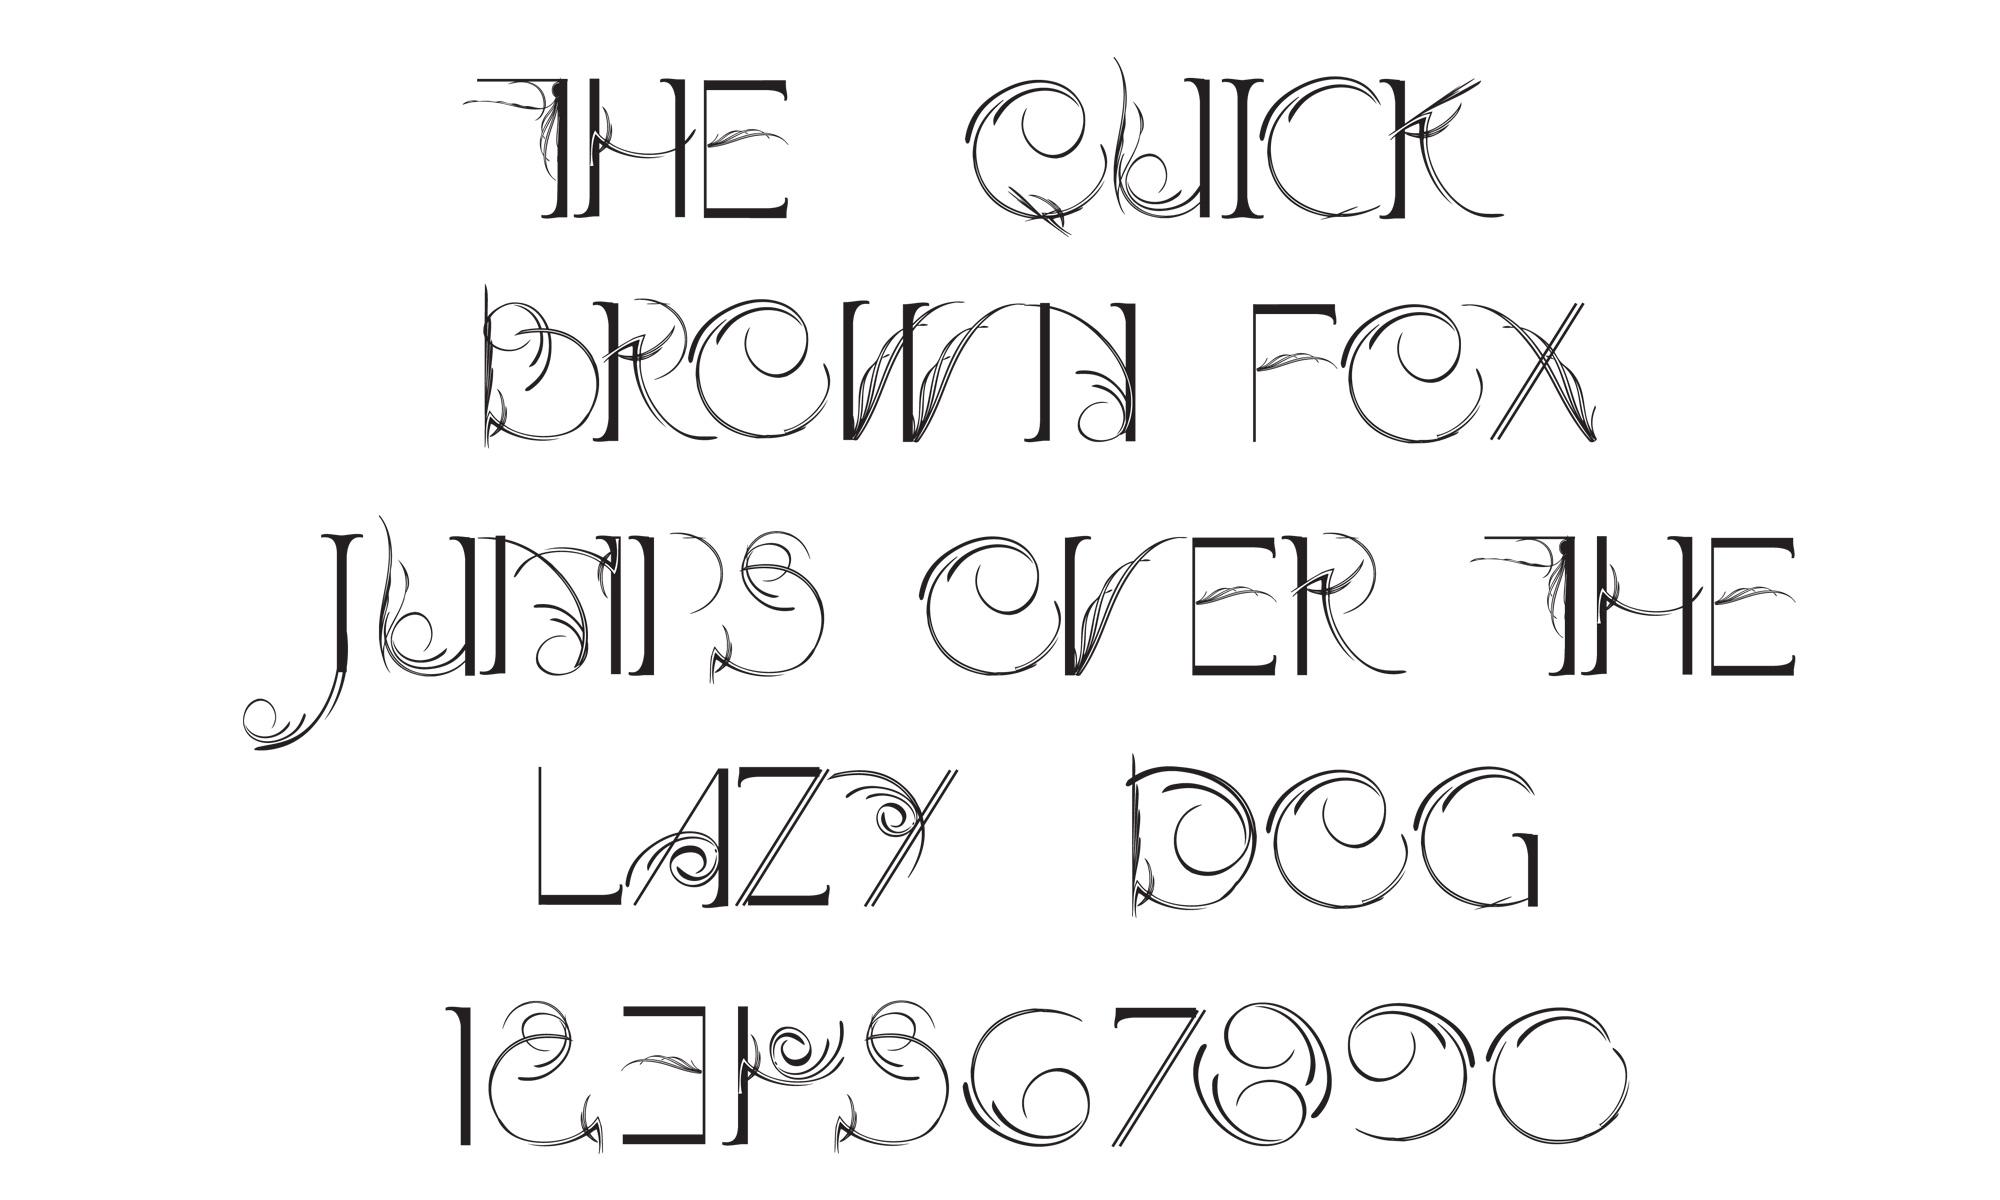 google font size guidelines mobile